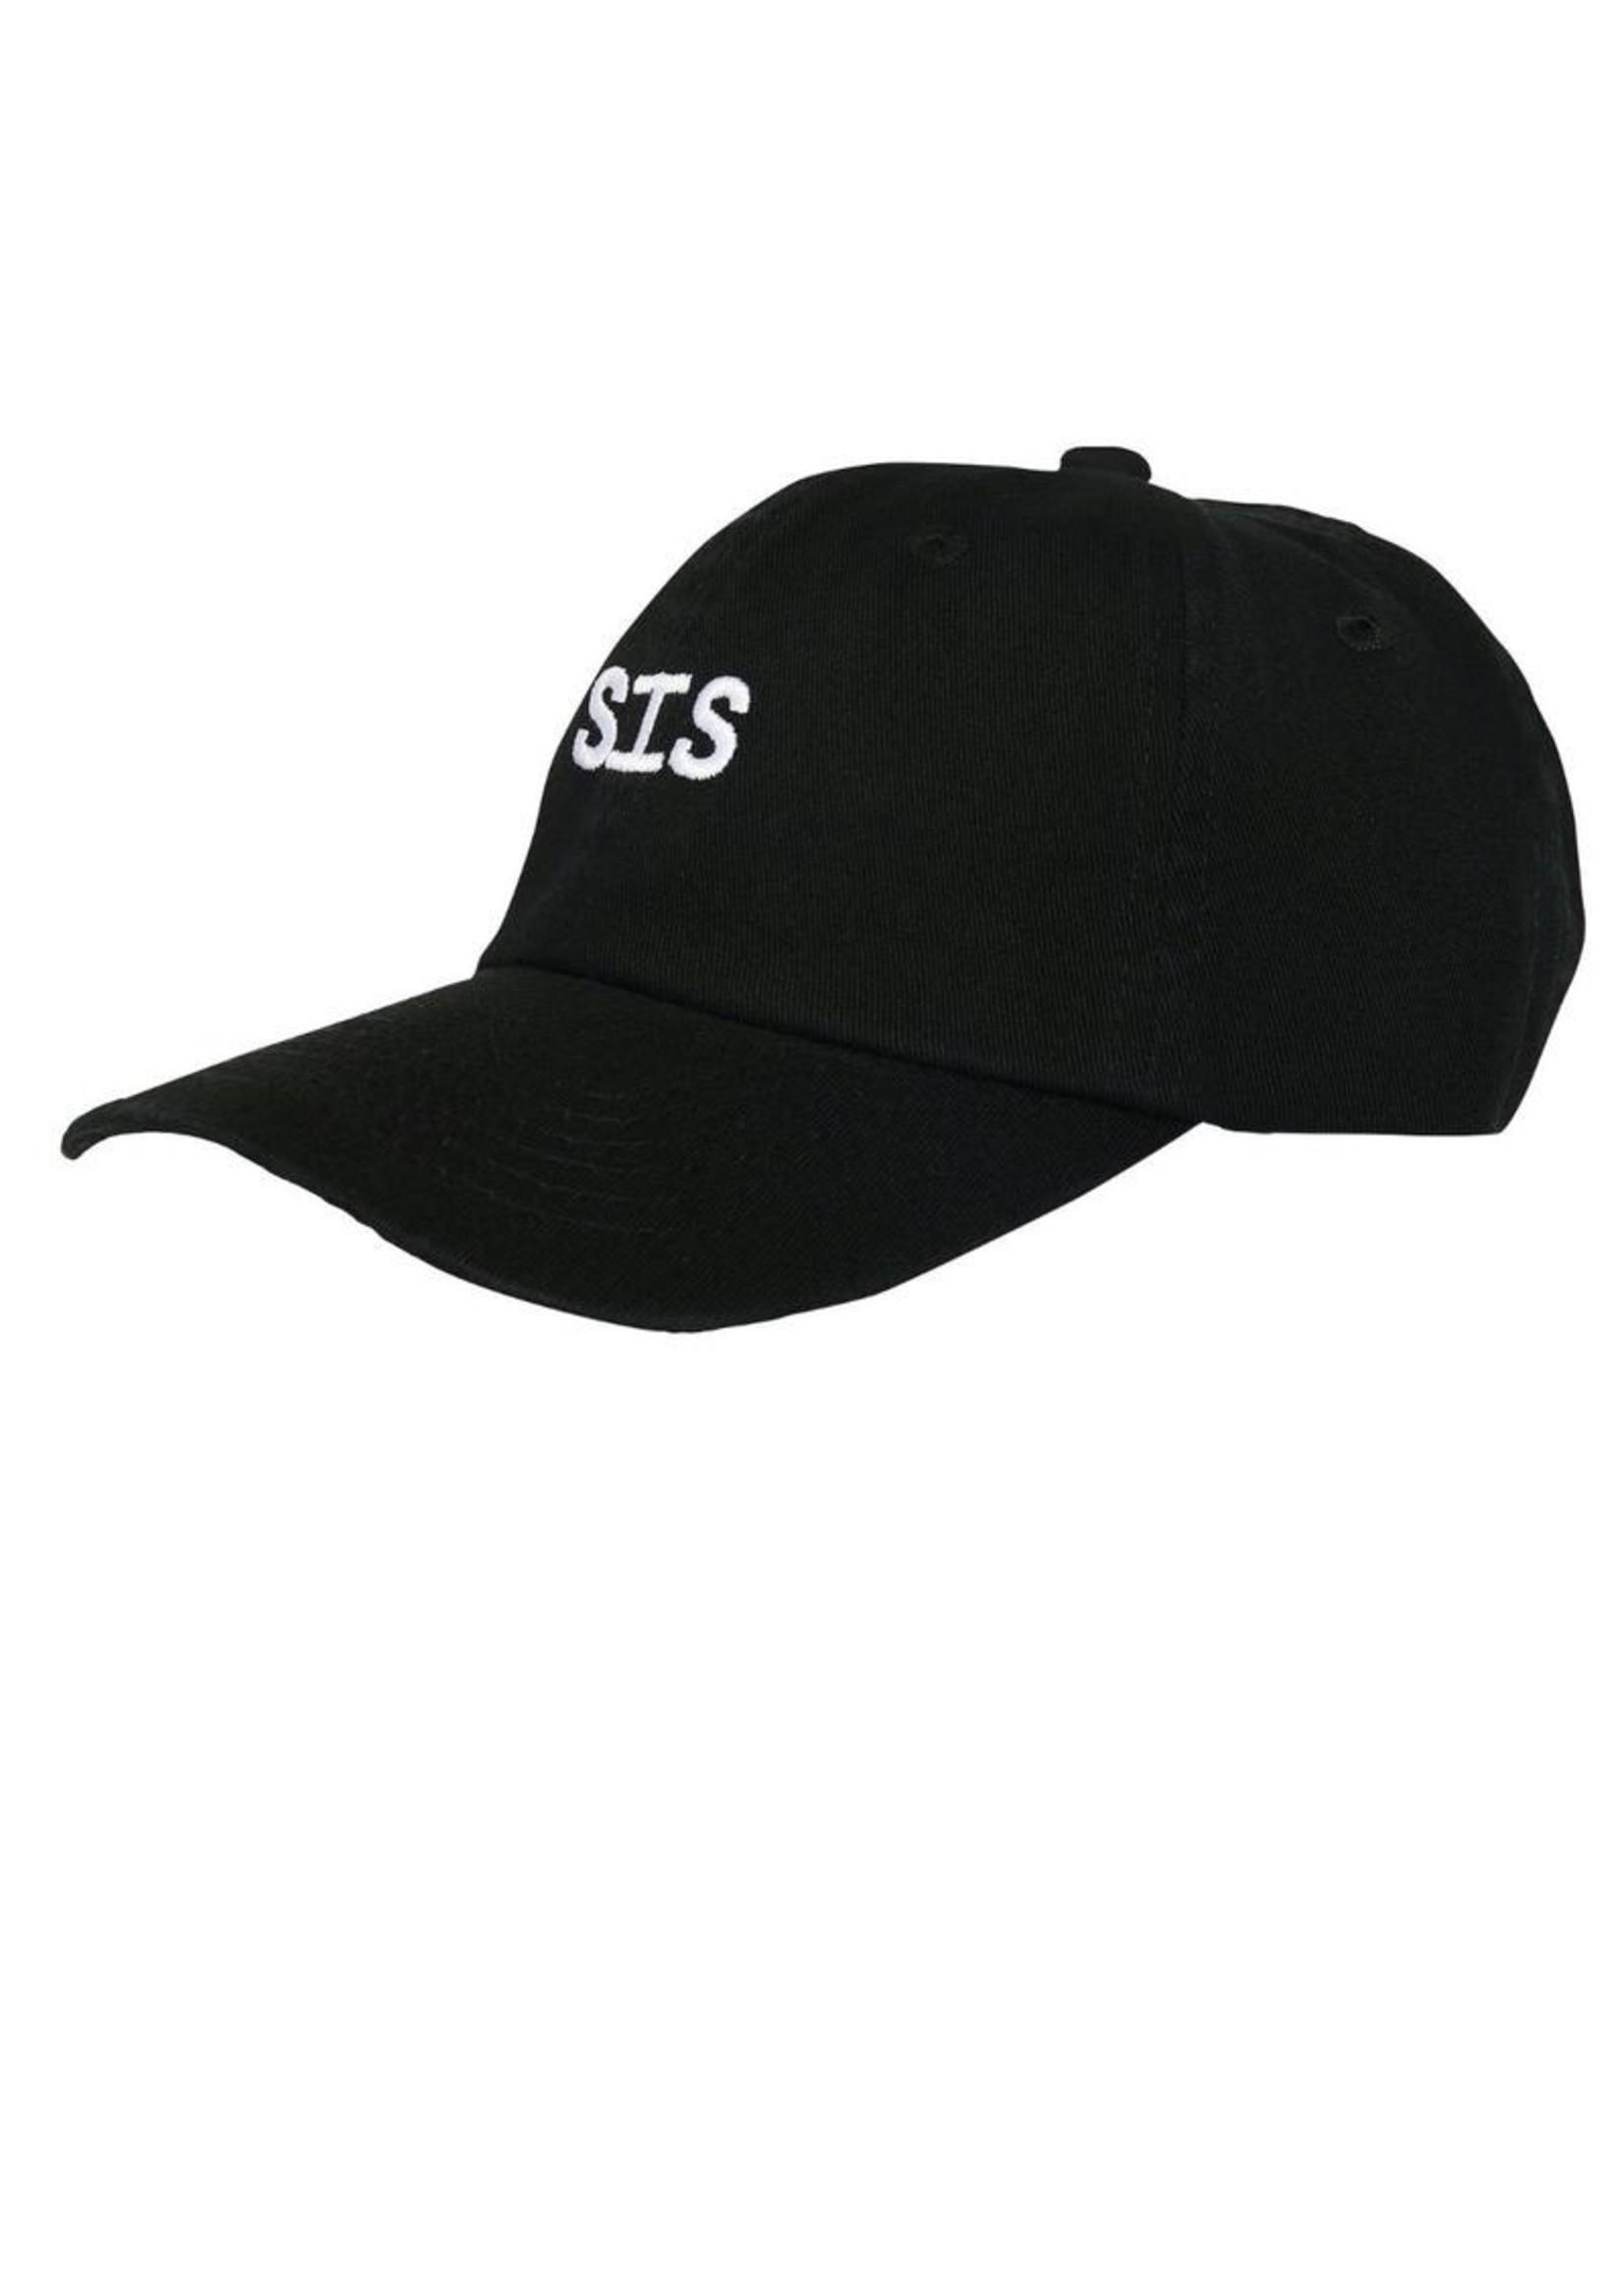 Headster Kids Headster Kids, Sis Adjustable Hat